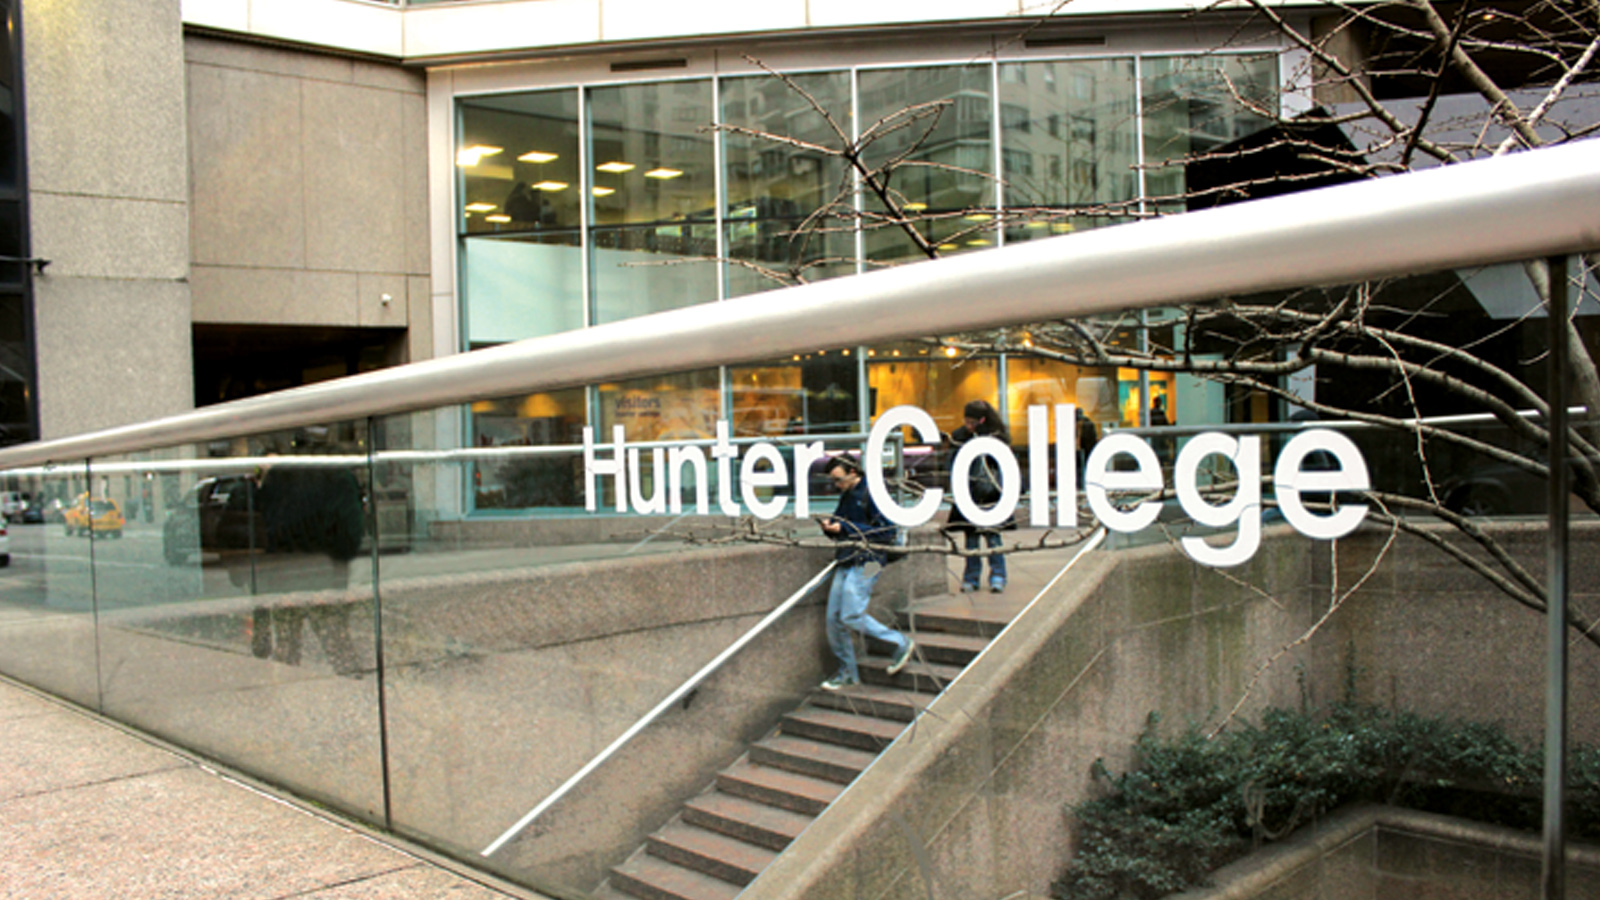 Hunter College subway station